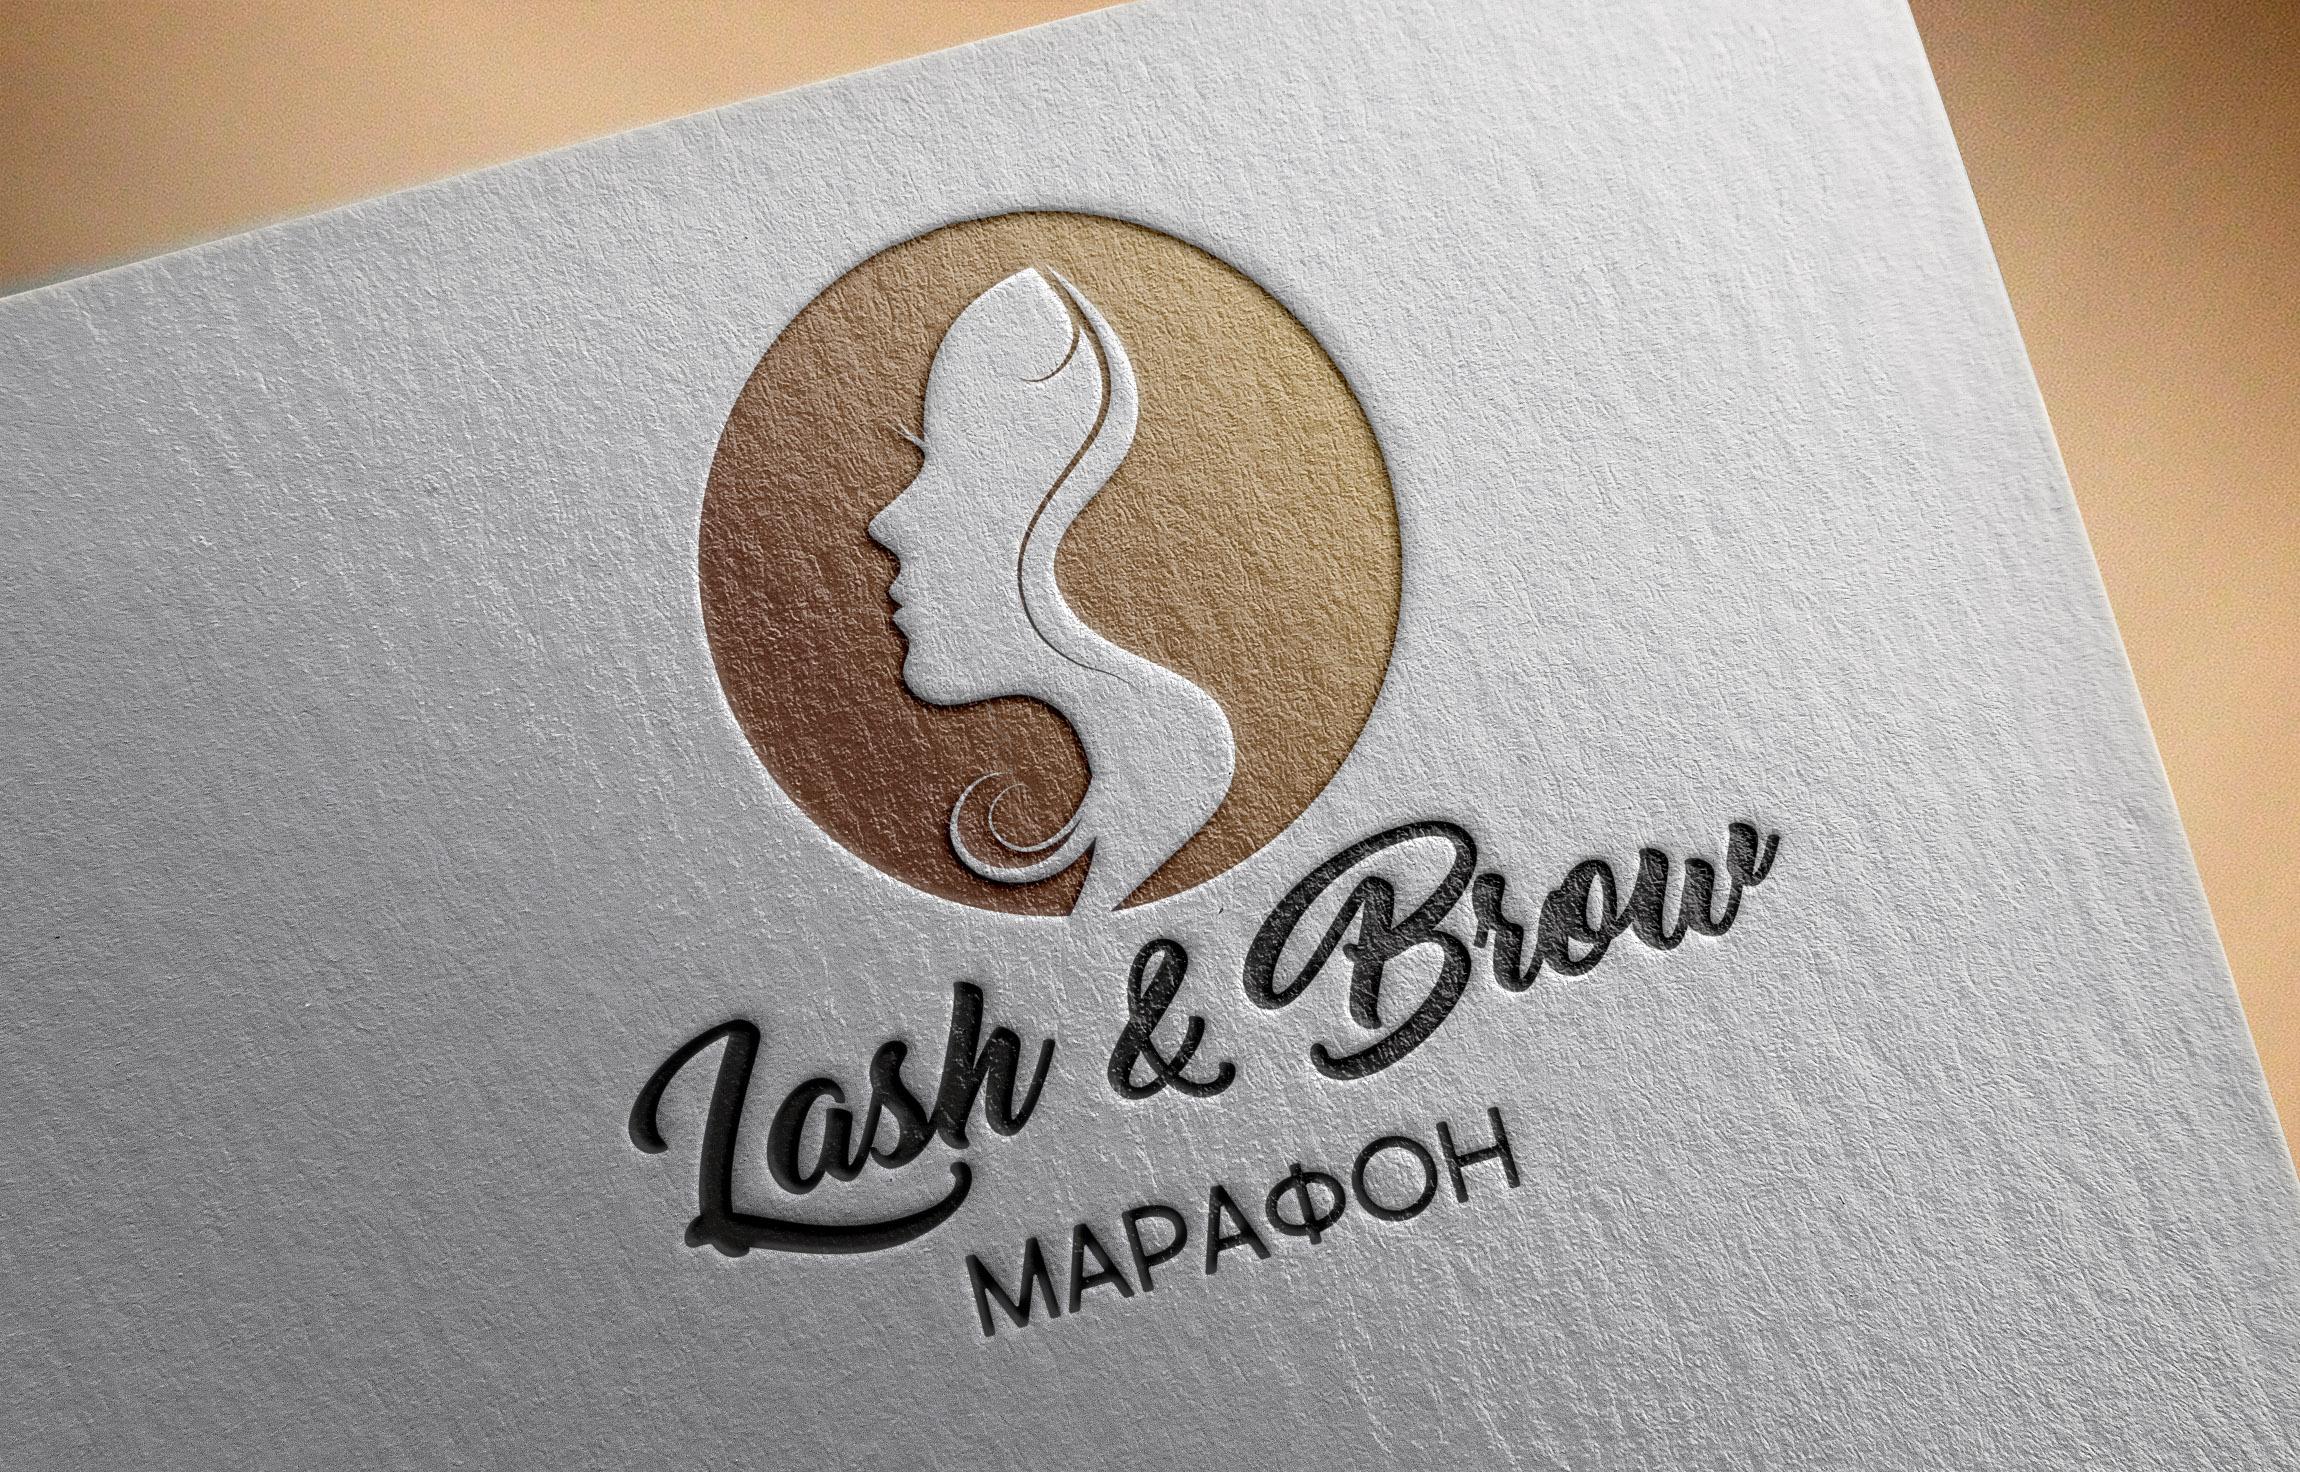 "Создание логотипа мероприятия ""Марафон Lash&Brow"" фото f_92058f91408b0c17.jpg"